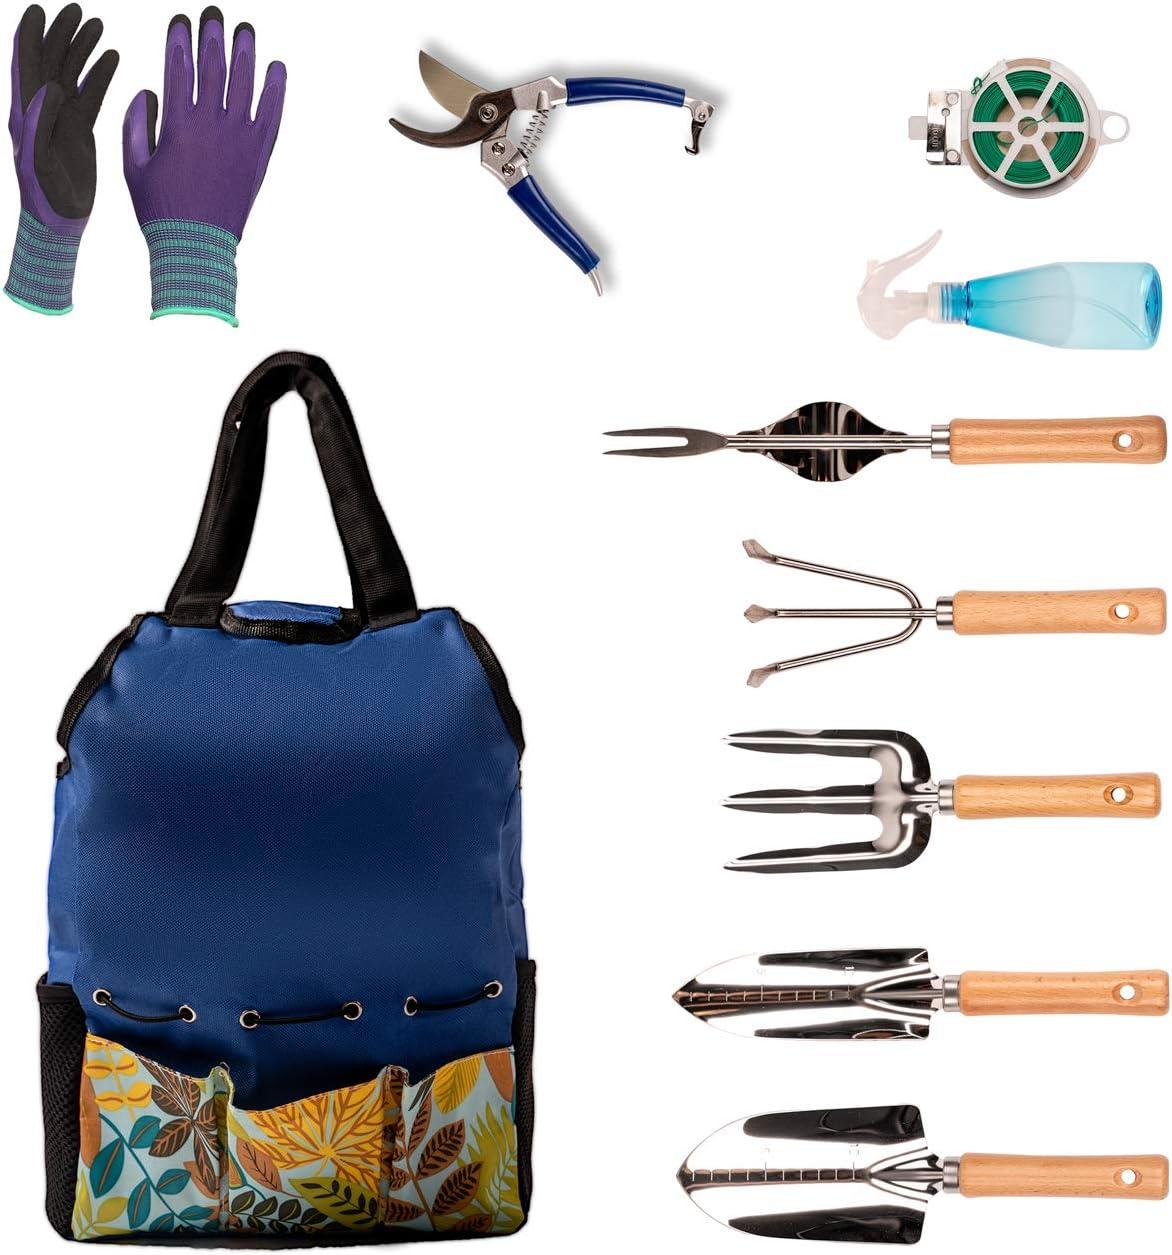 Rainyk 10 Pieces Garden Tool Set—Stainless Steel Heavy Duty Gardening Tools —Gardening Gifts for Women Men